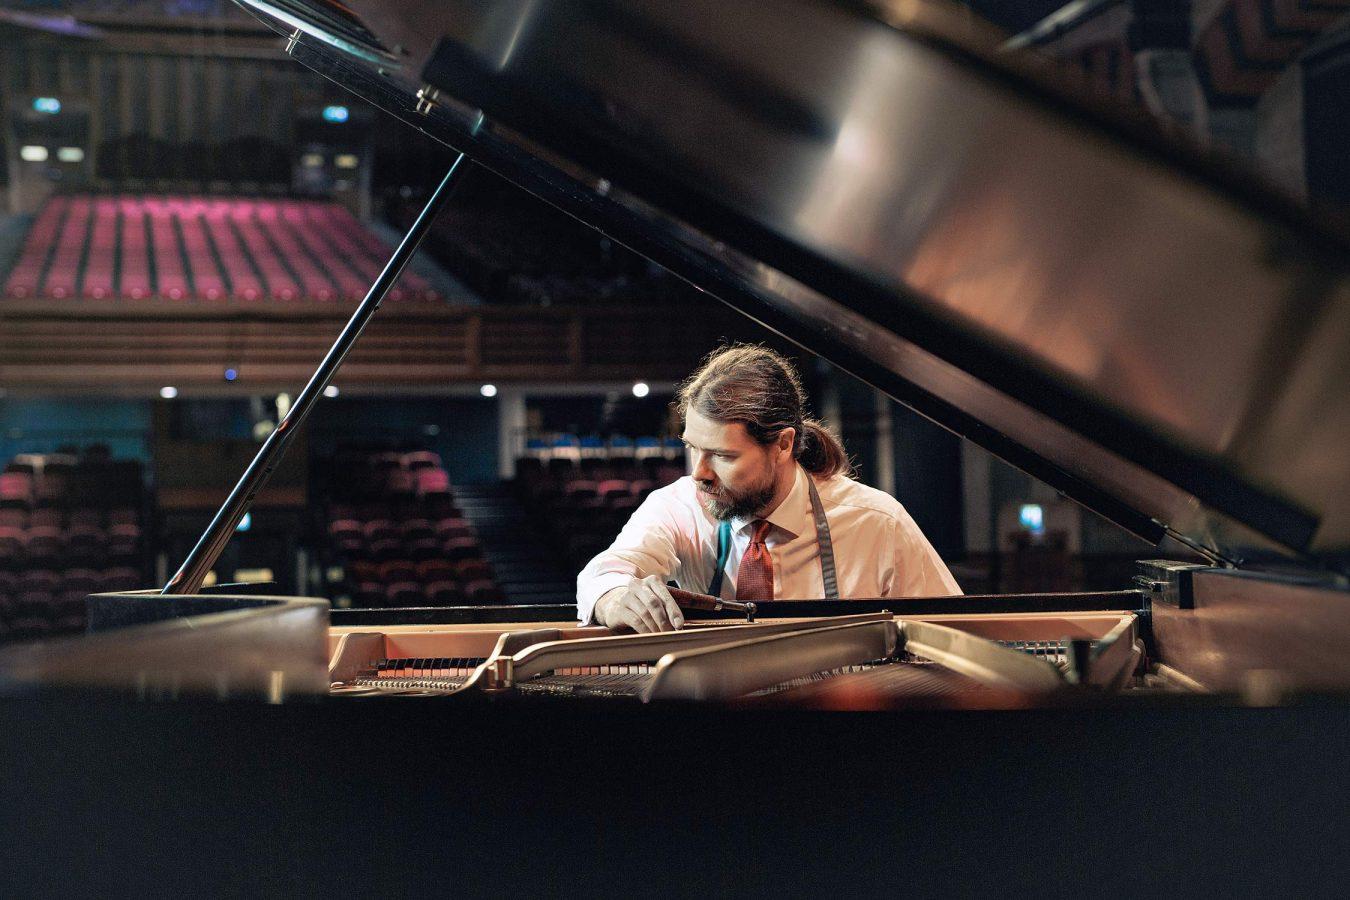 cambridge-portrait-photography-piano-tuner